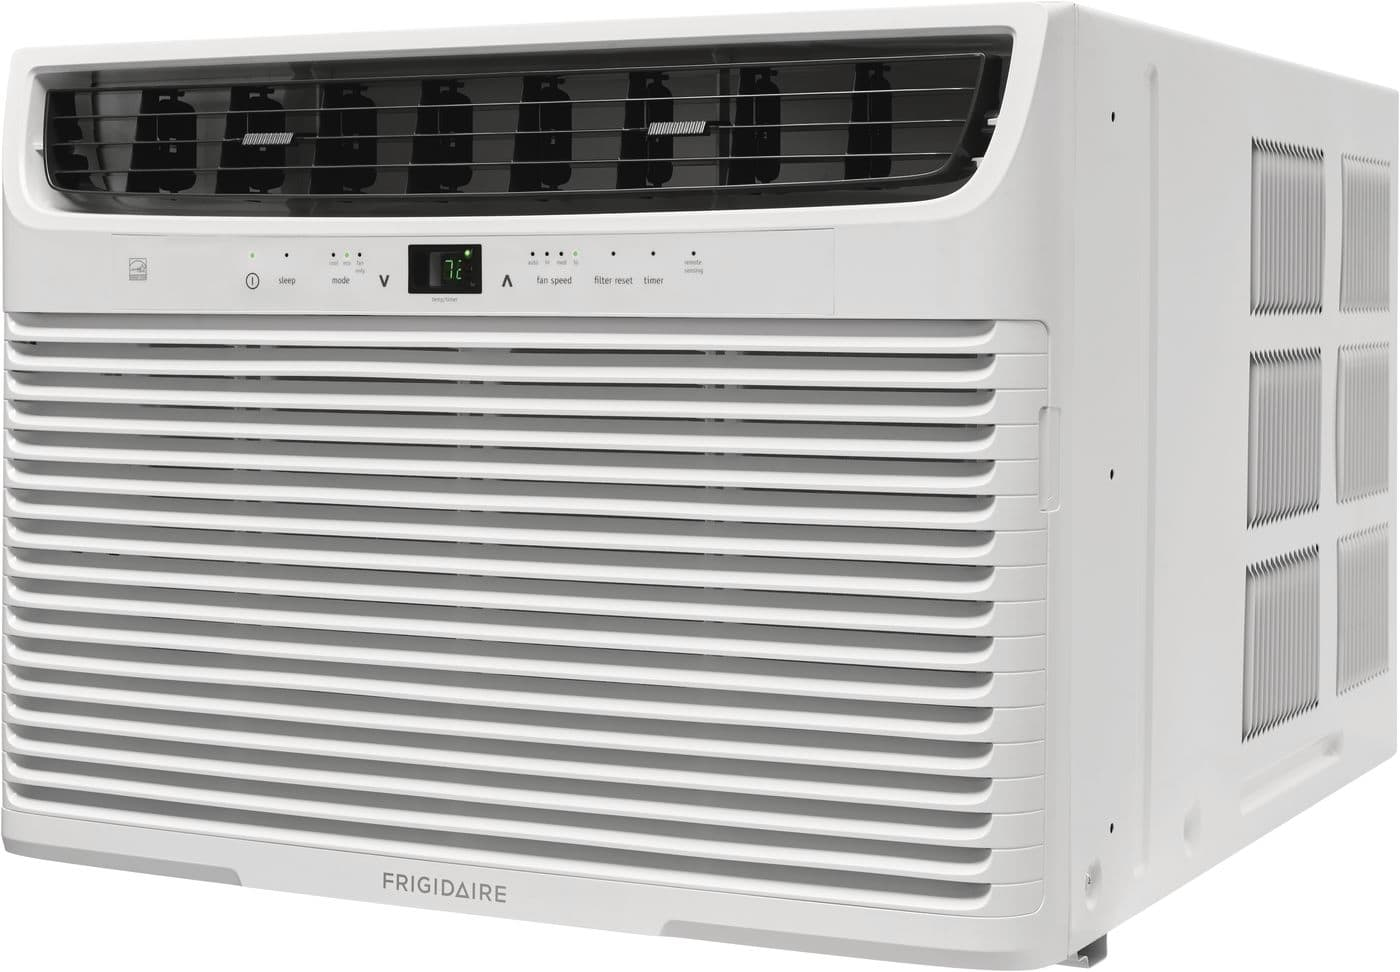 Model: FFRE123ZA1 | Frigidaire 12,000 BTU Window-Mounted Room Air Conditioner